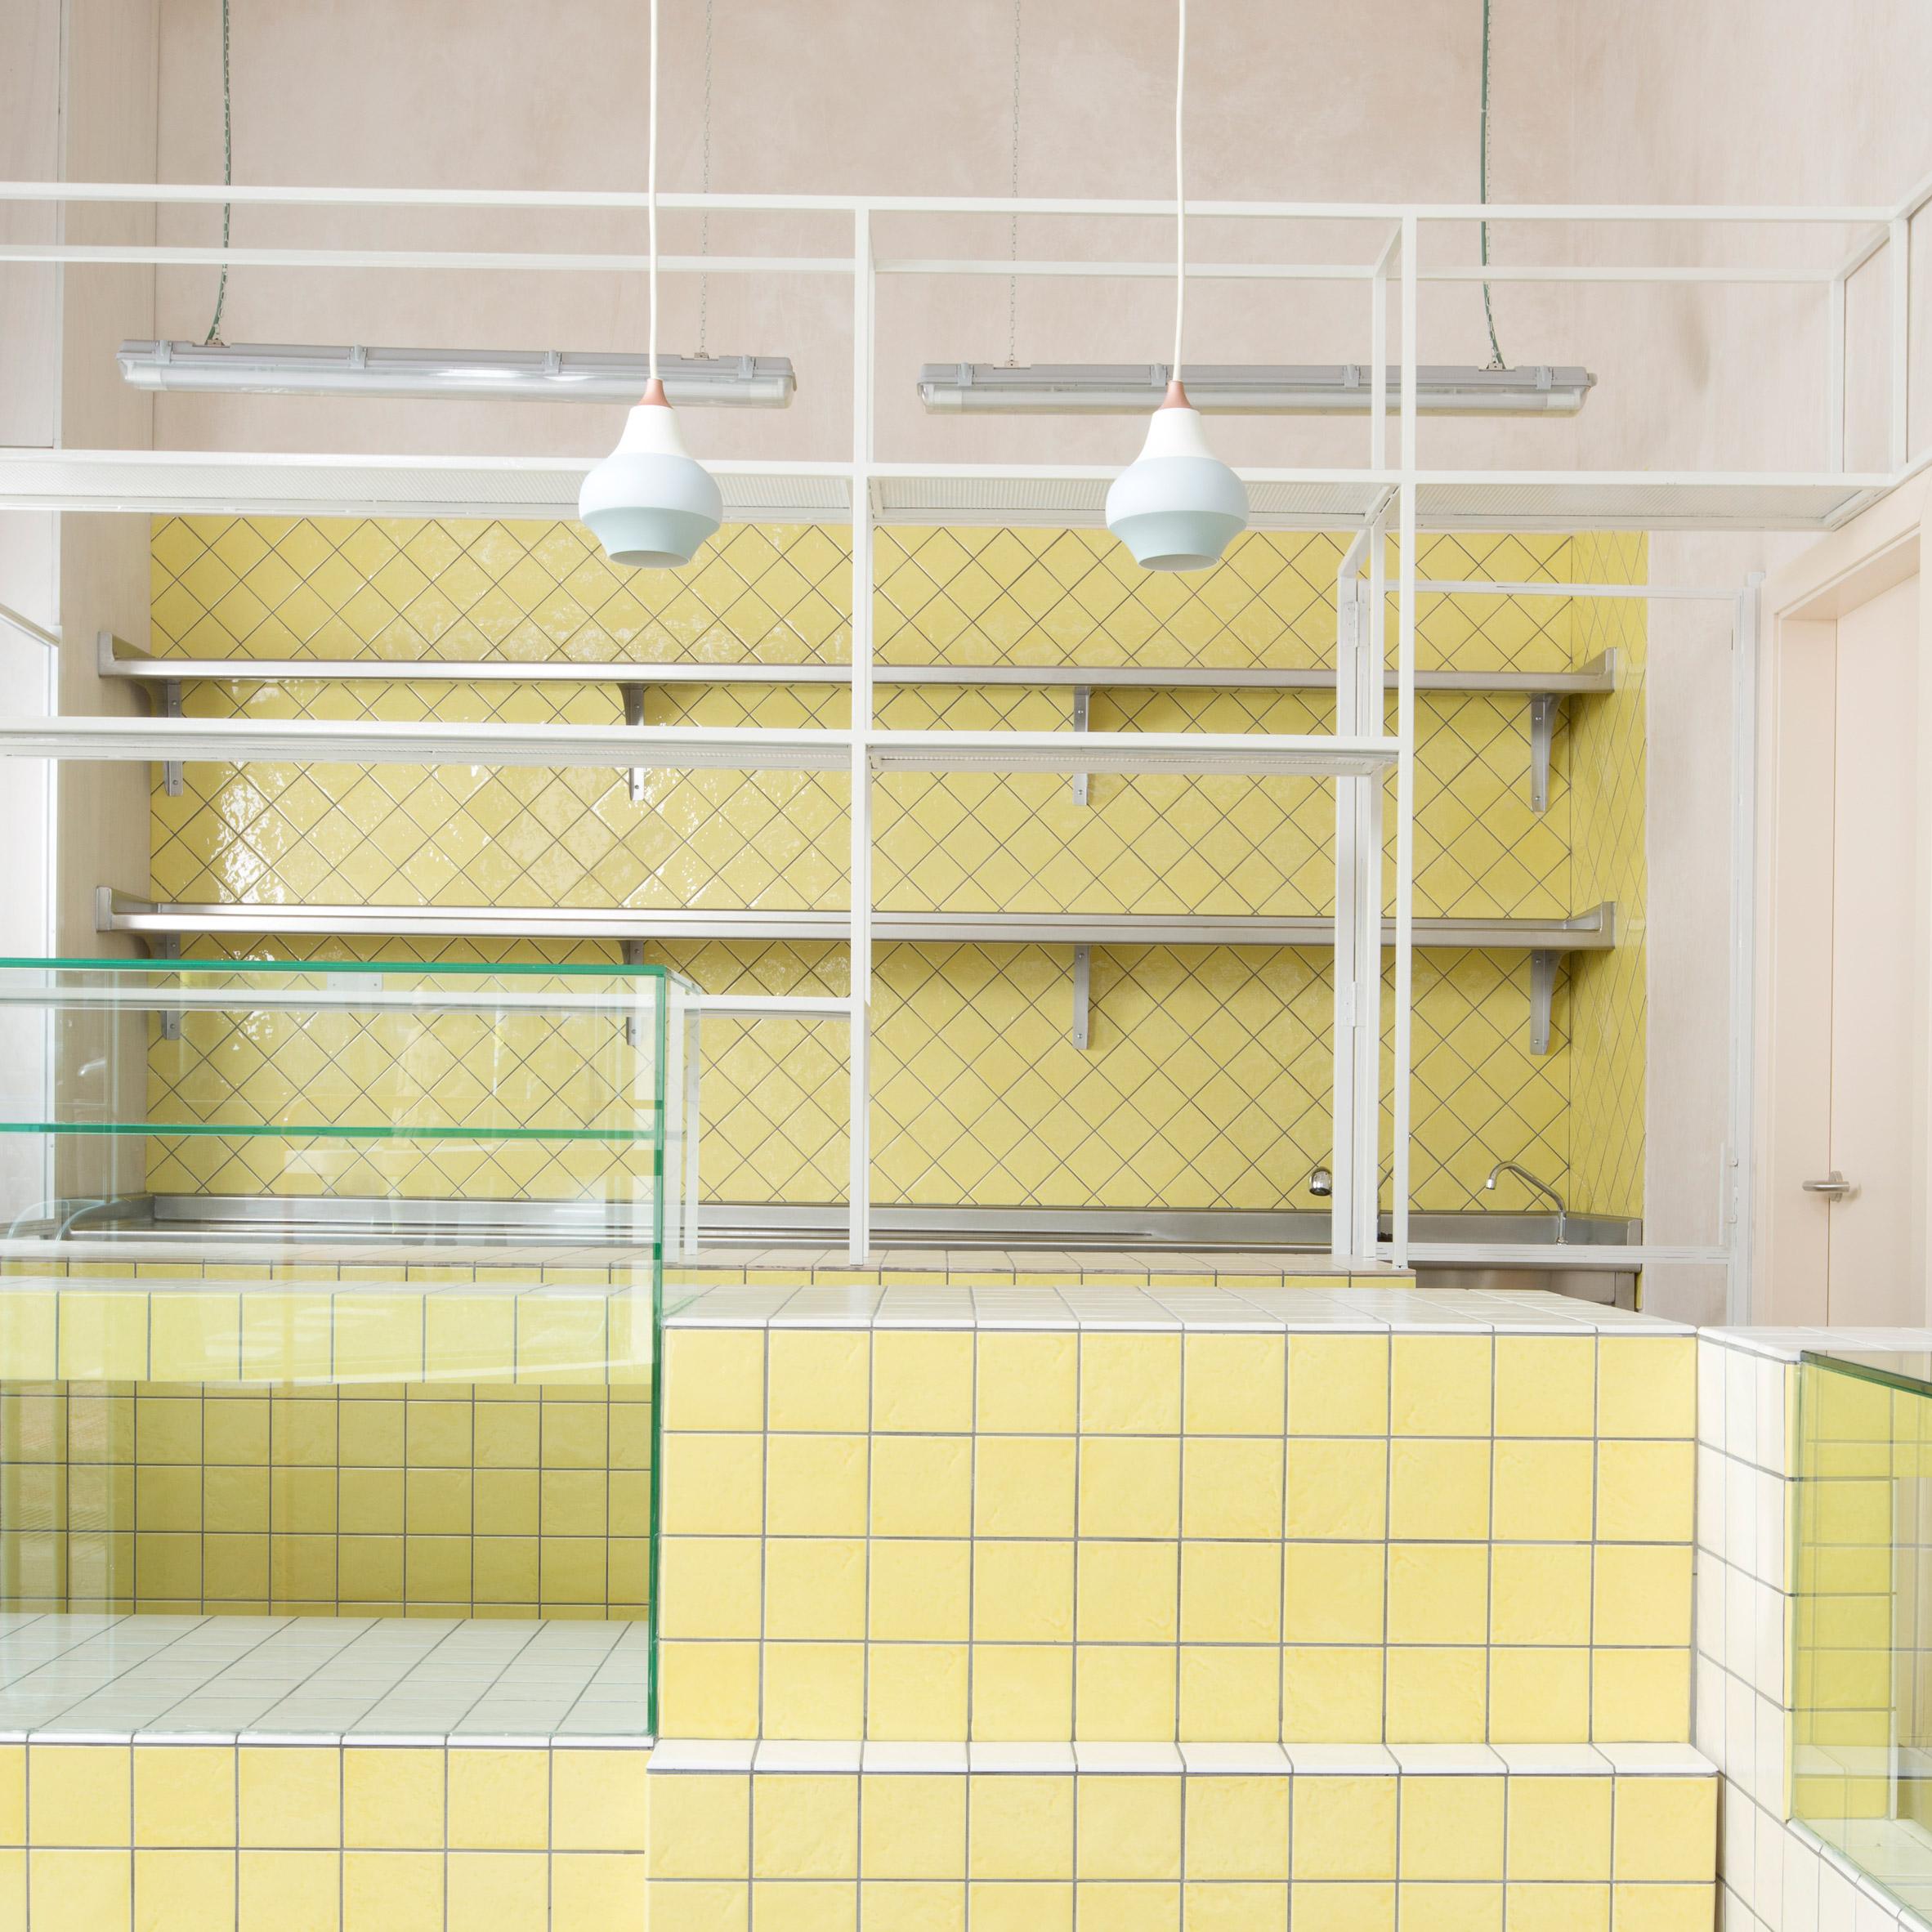 Baking ingredients inform soft-hued interiors of Juana Limón